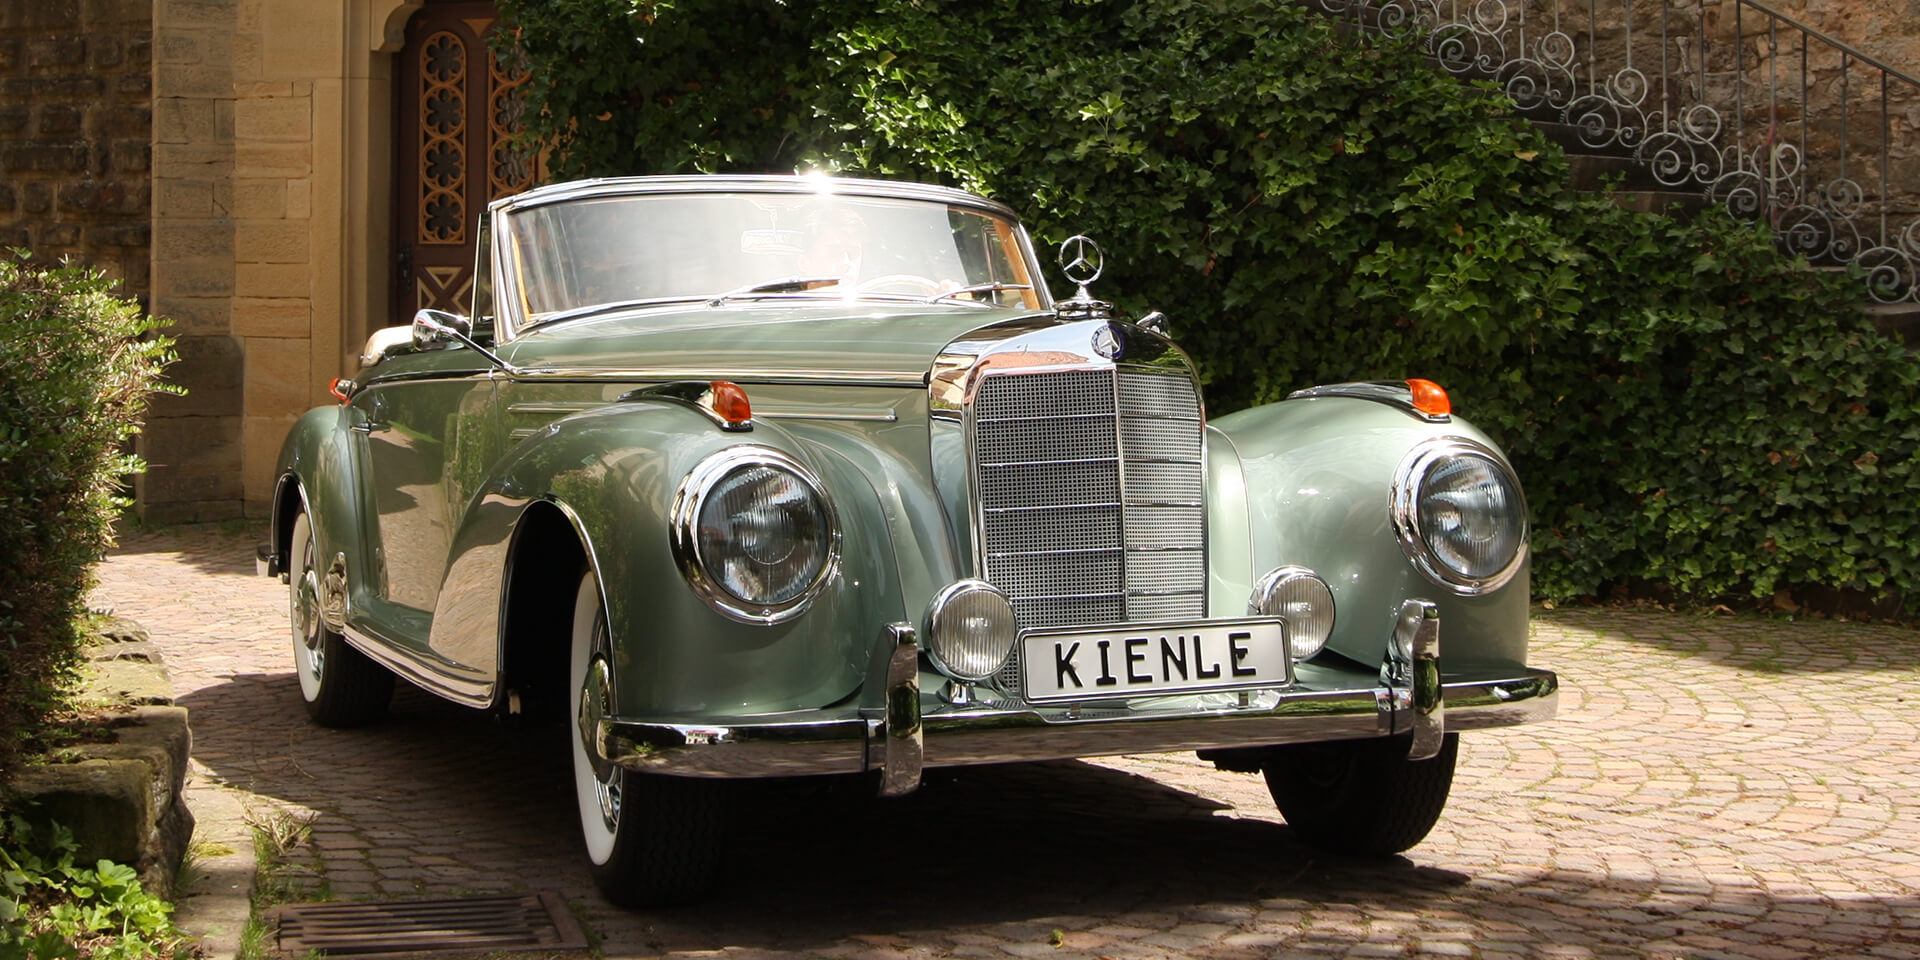 Vintage Mercedes cars from Kienle Automobiltechnik